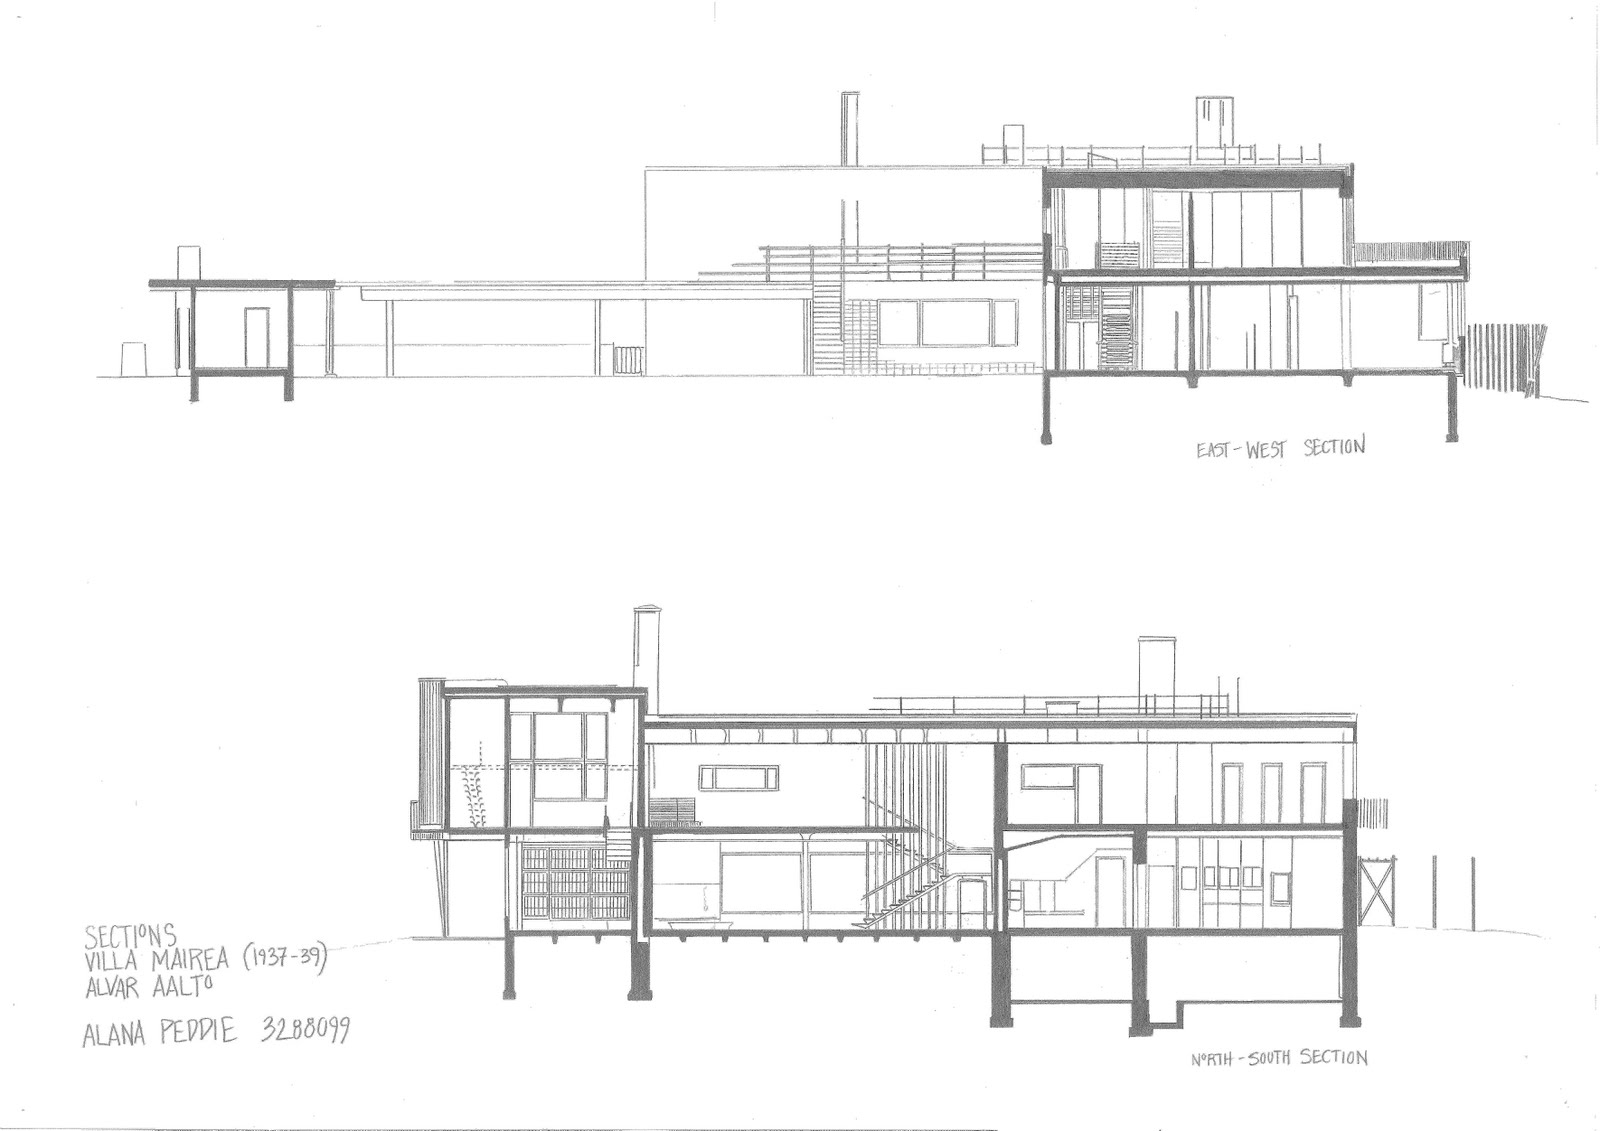 Finland alvar aalto and villas on pinterest for Plan maison facade